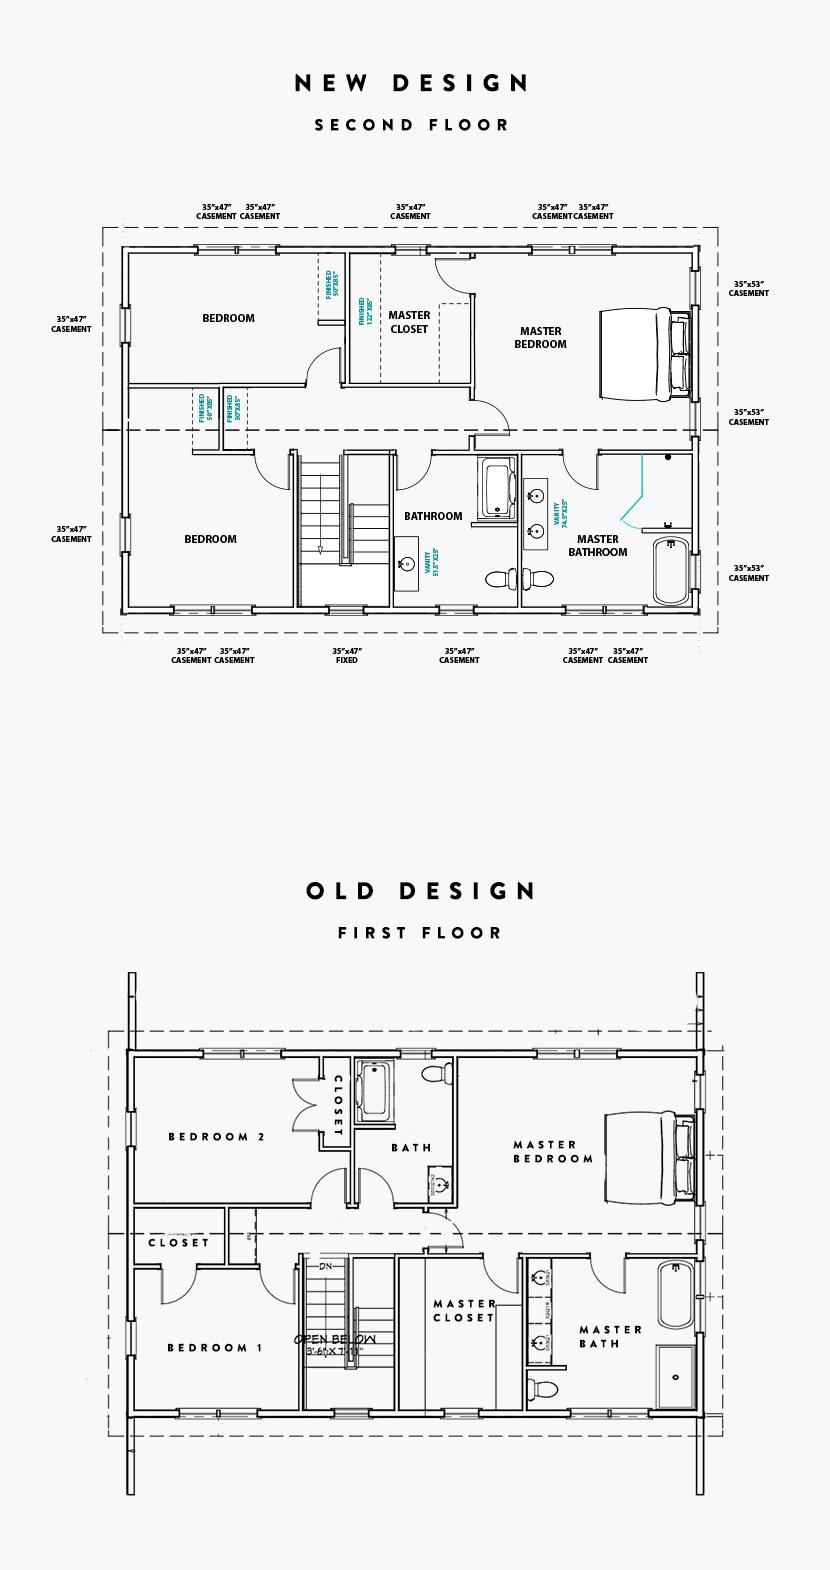 Building Home: Preparing for Framing. The Fresh Exchange